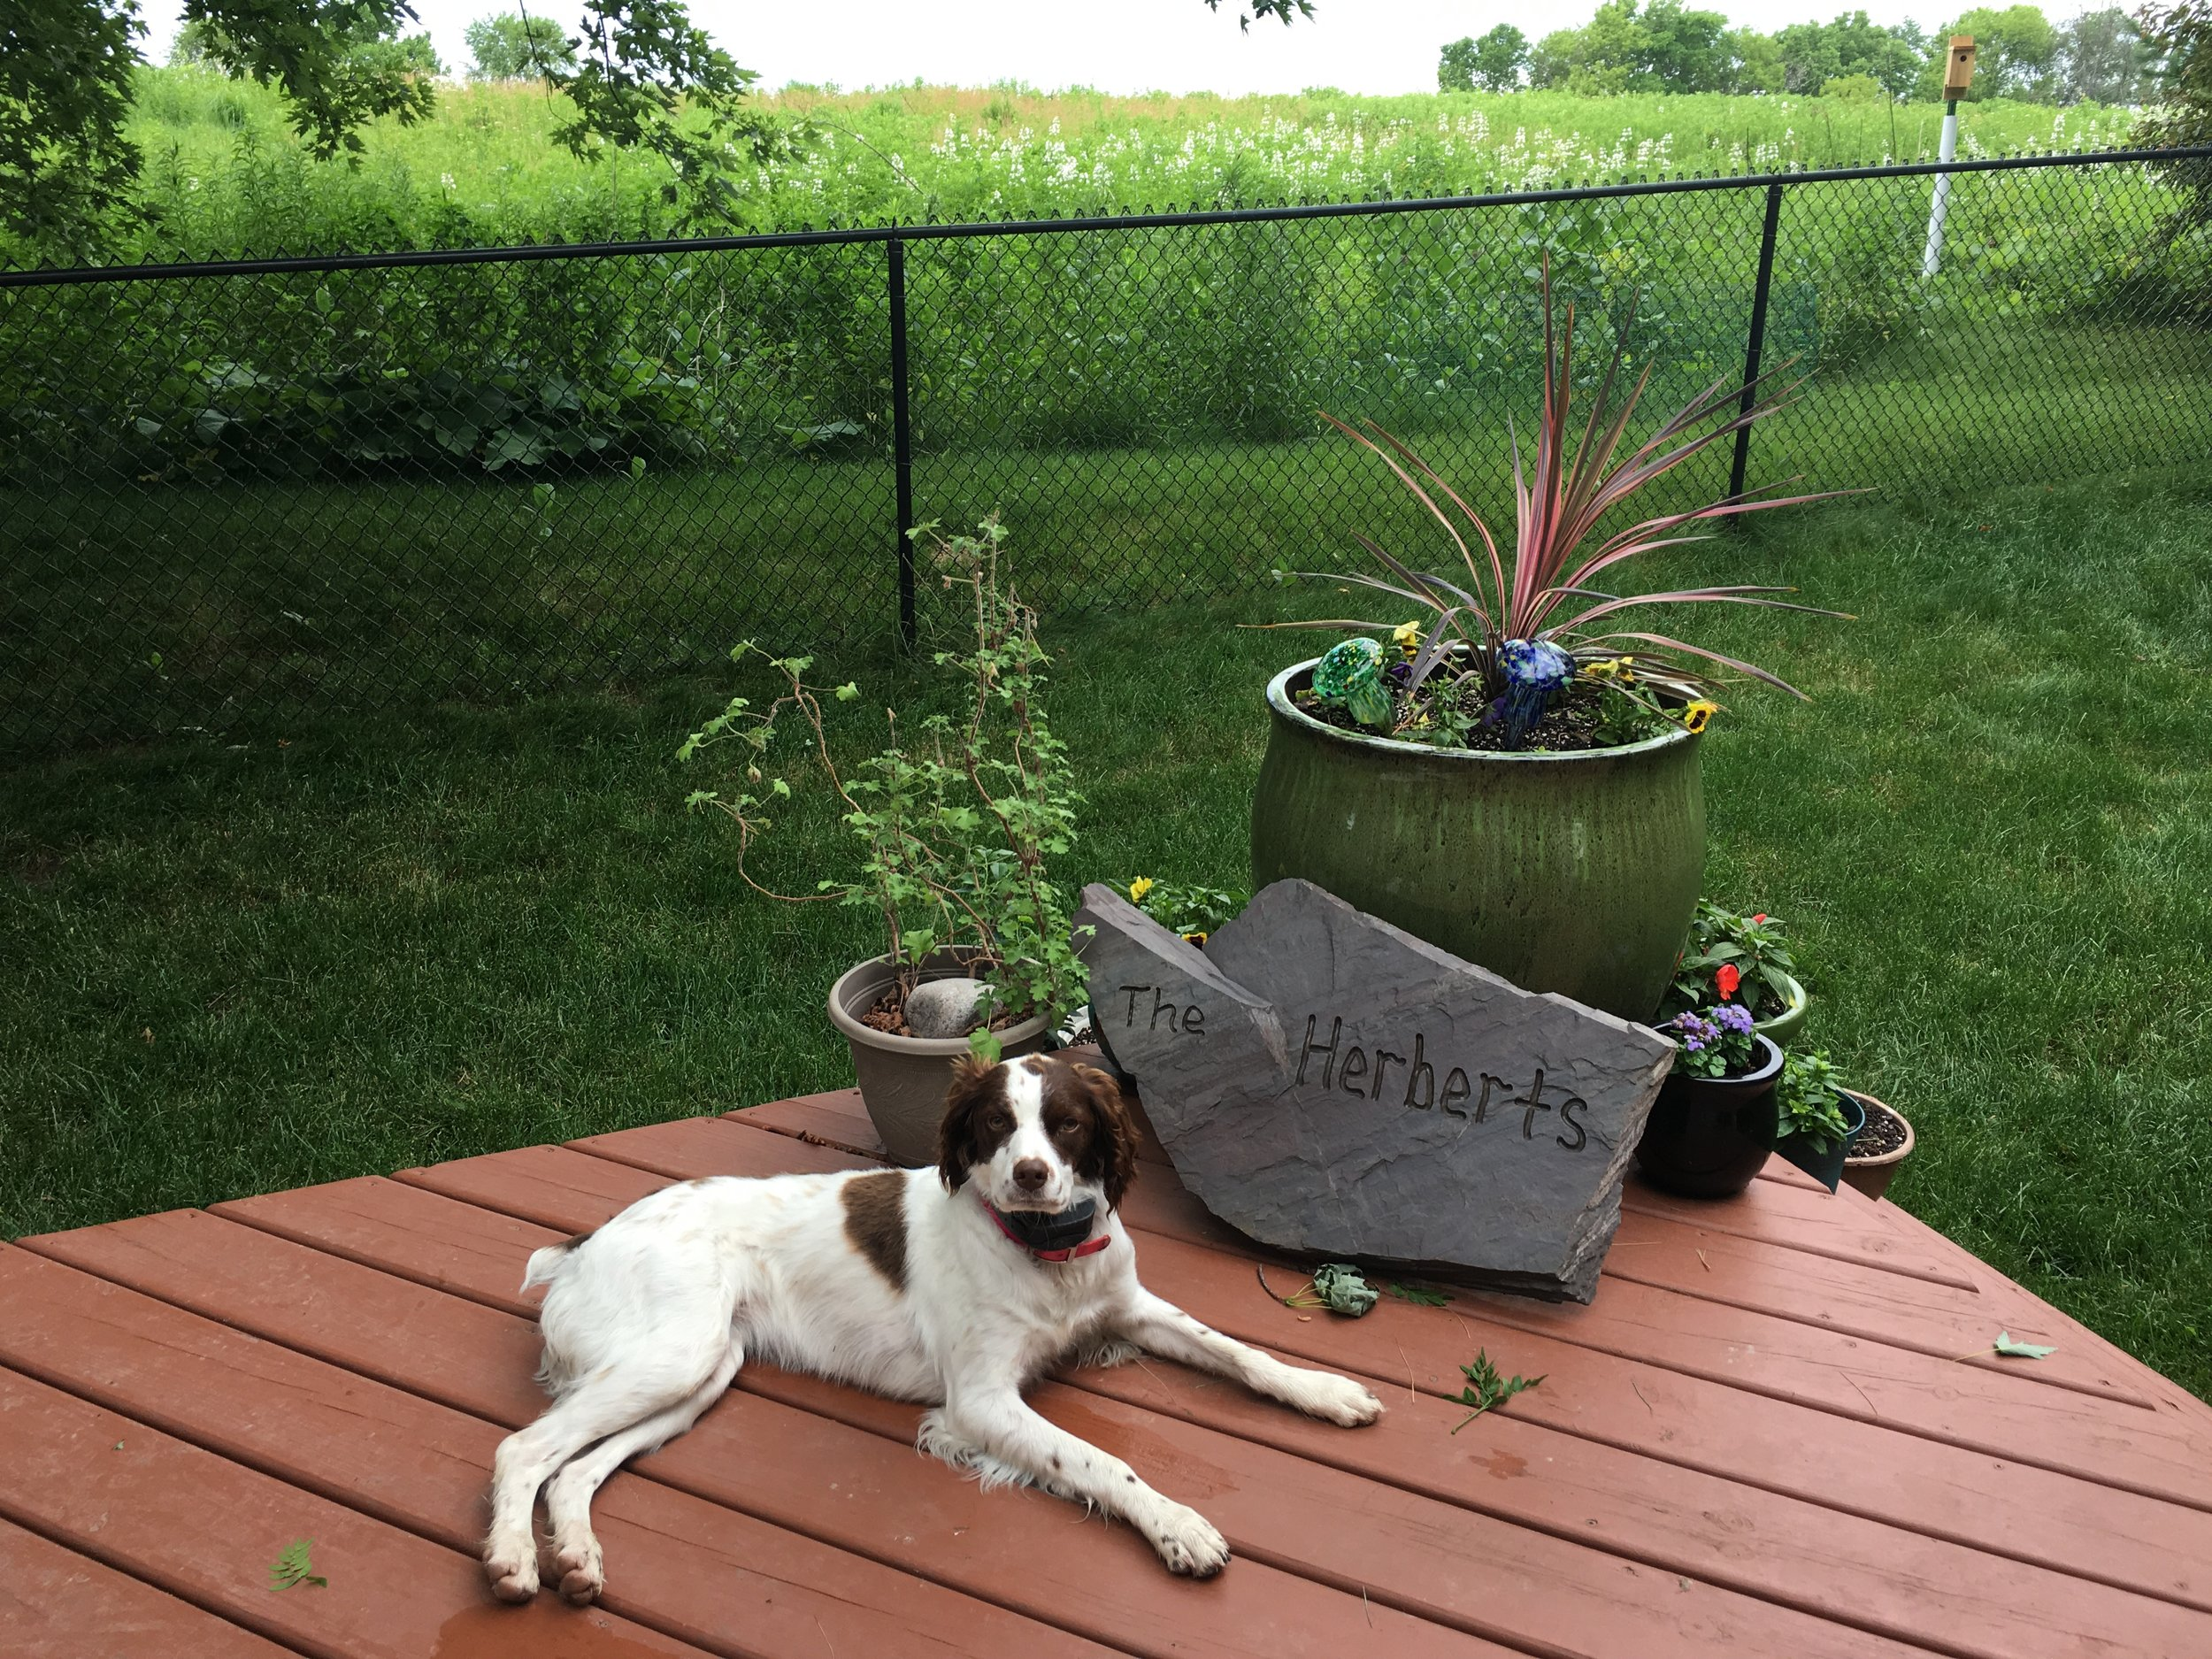 juneau loves our yard